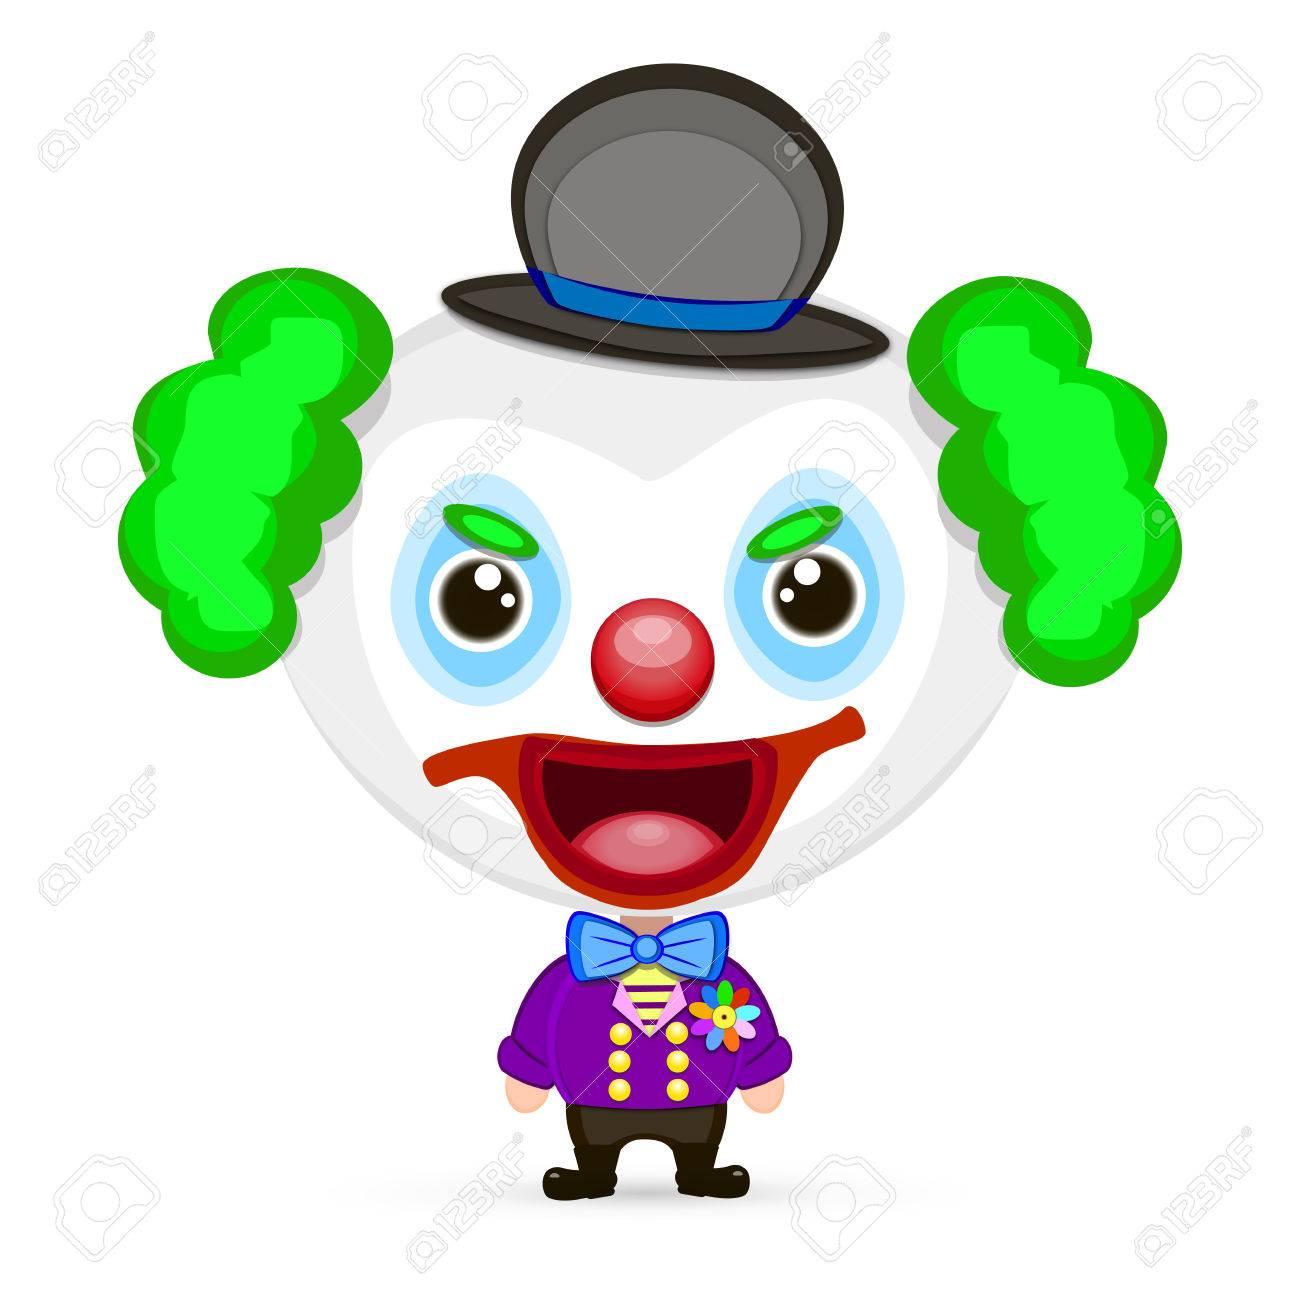 A Very Detailed Cartoon Halloween Clown Head Or Mask Royalty Free ...